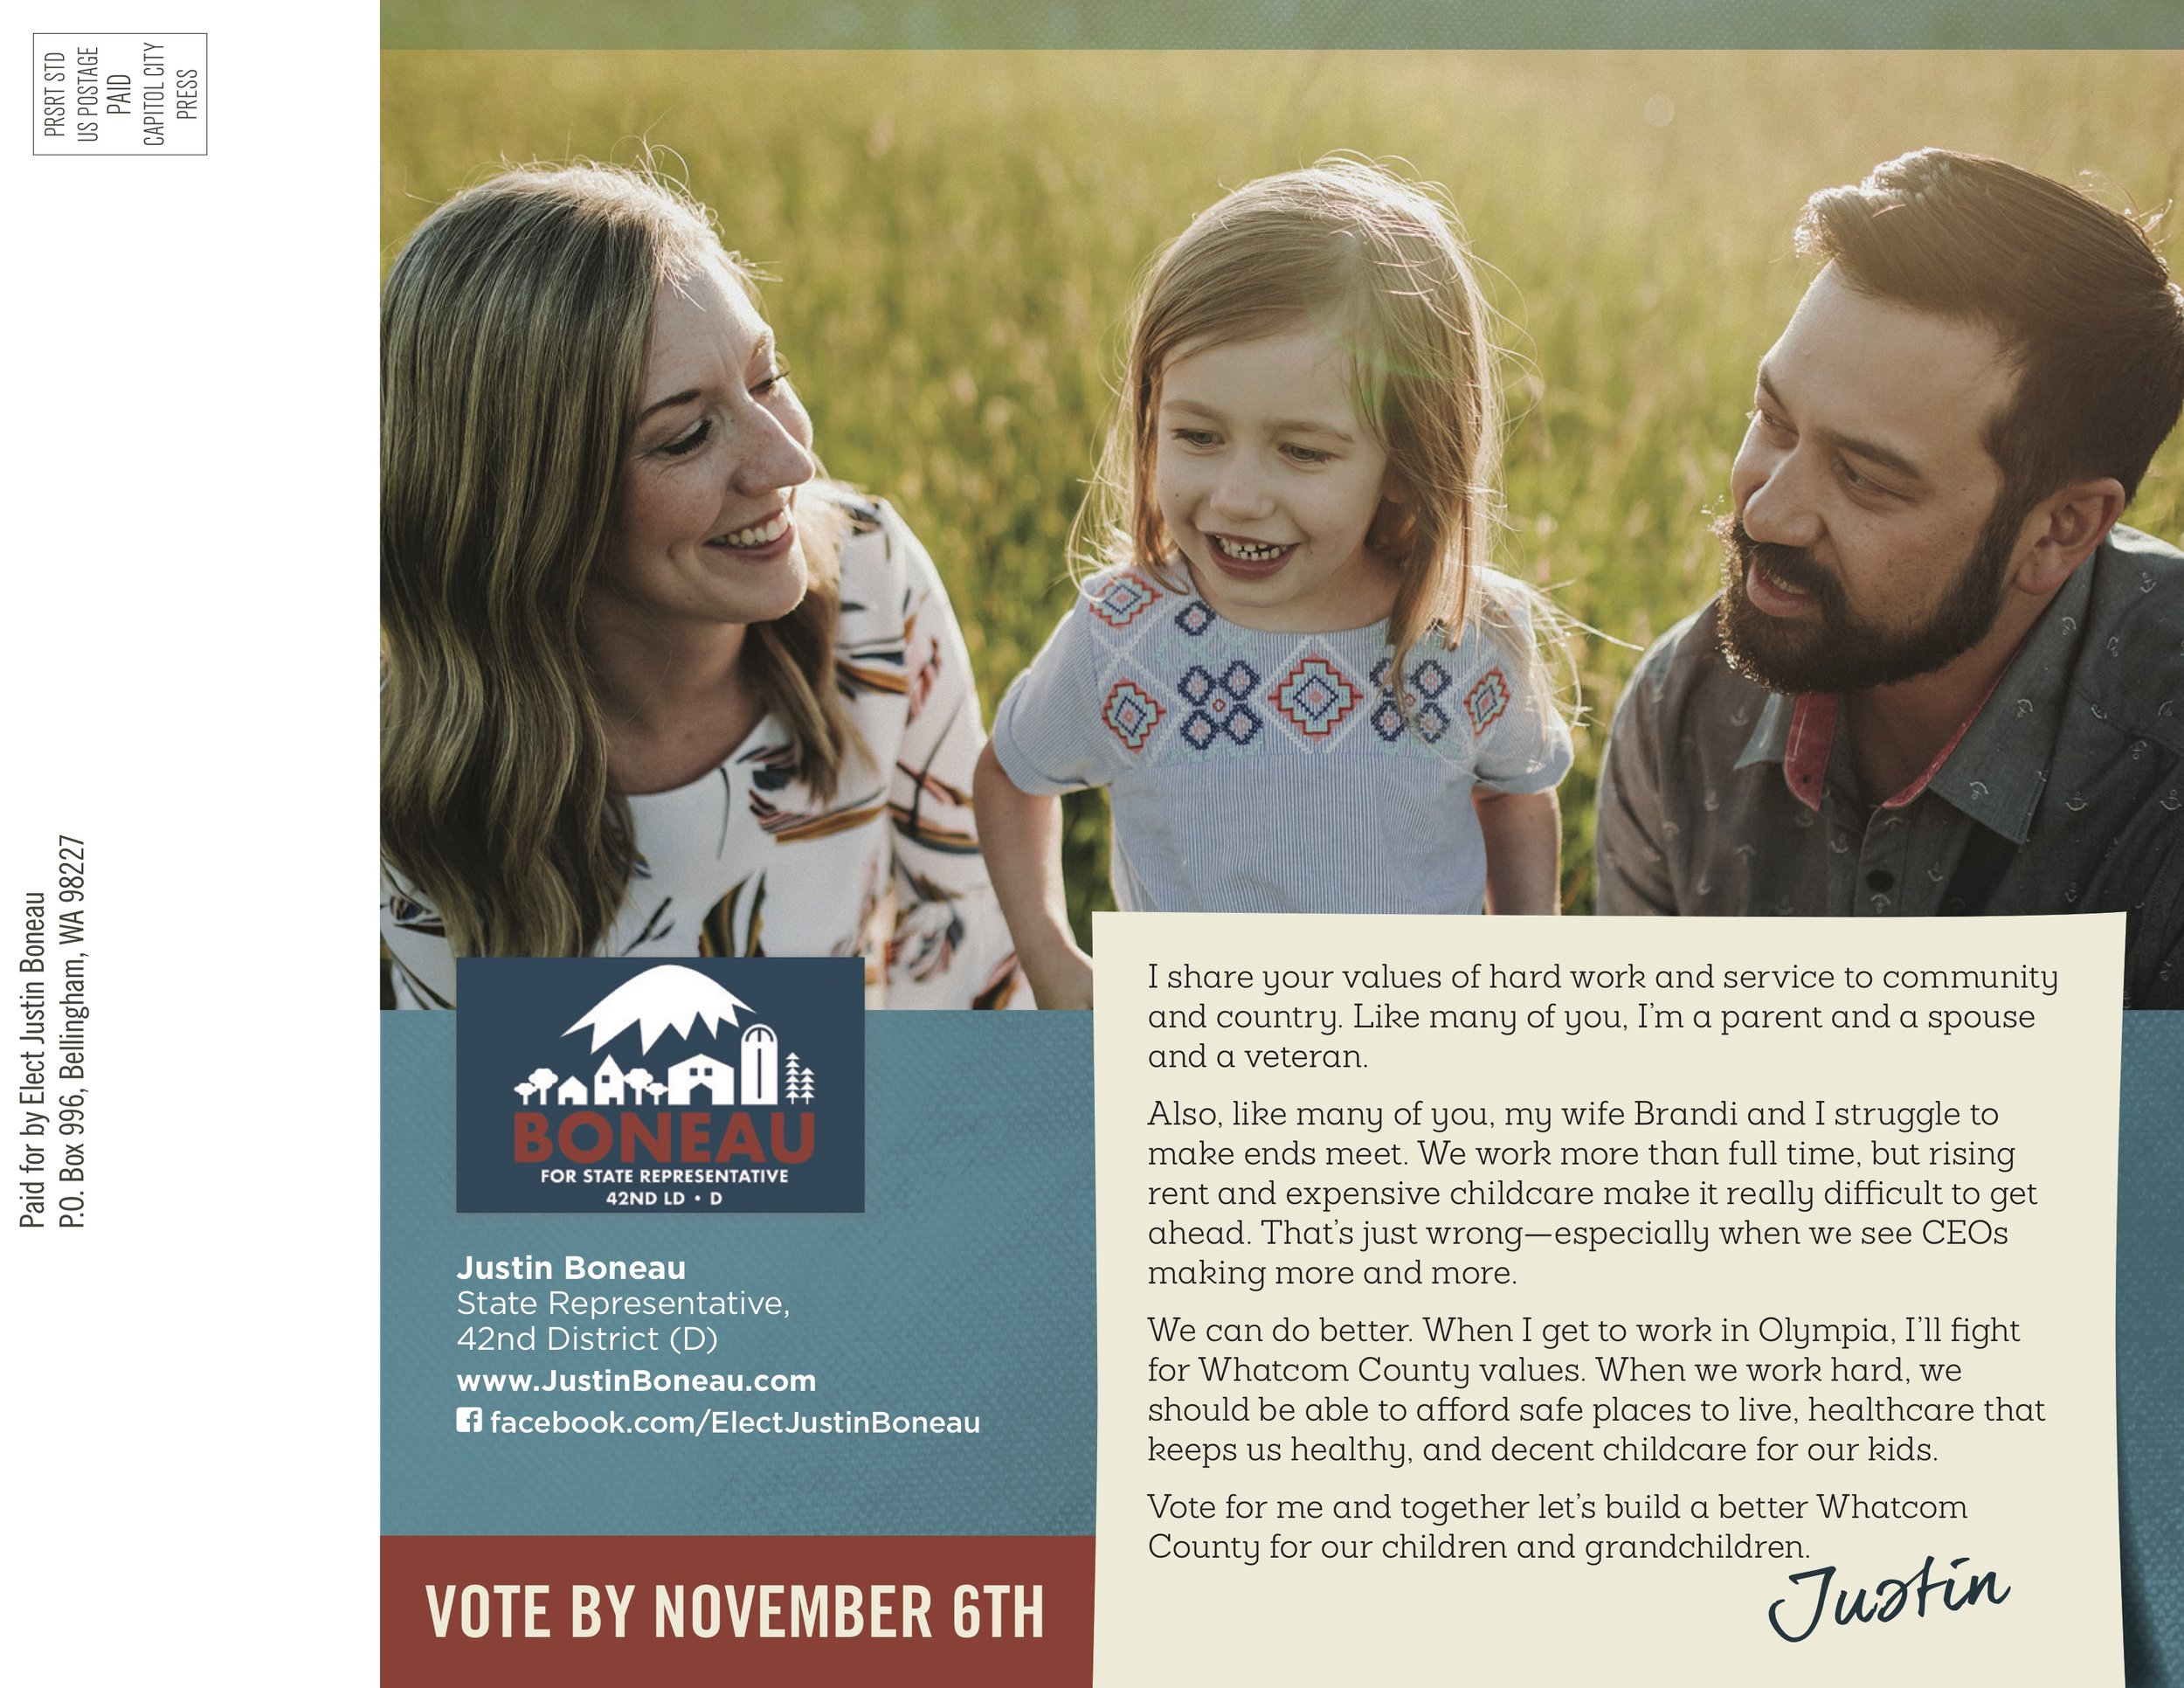 Closing Political Mailer Side 2